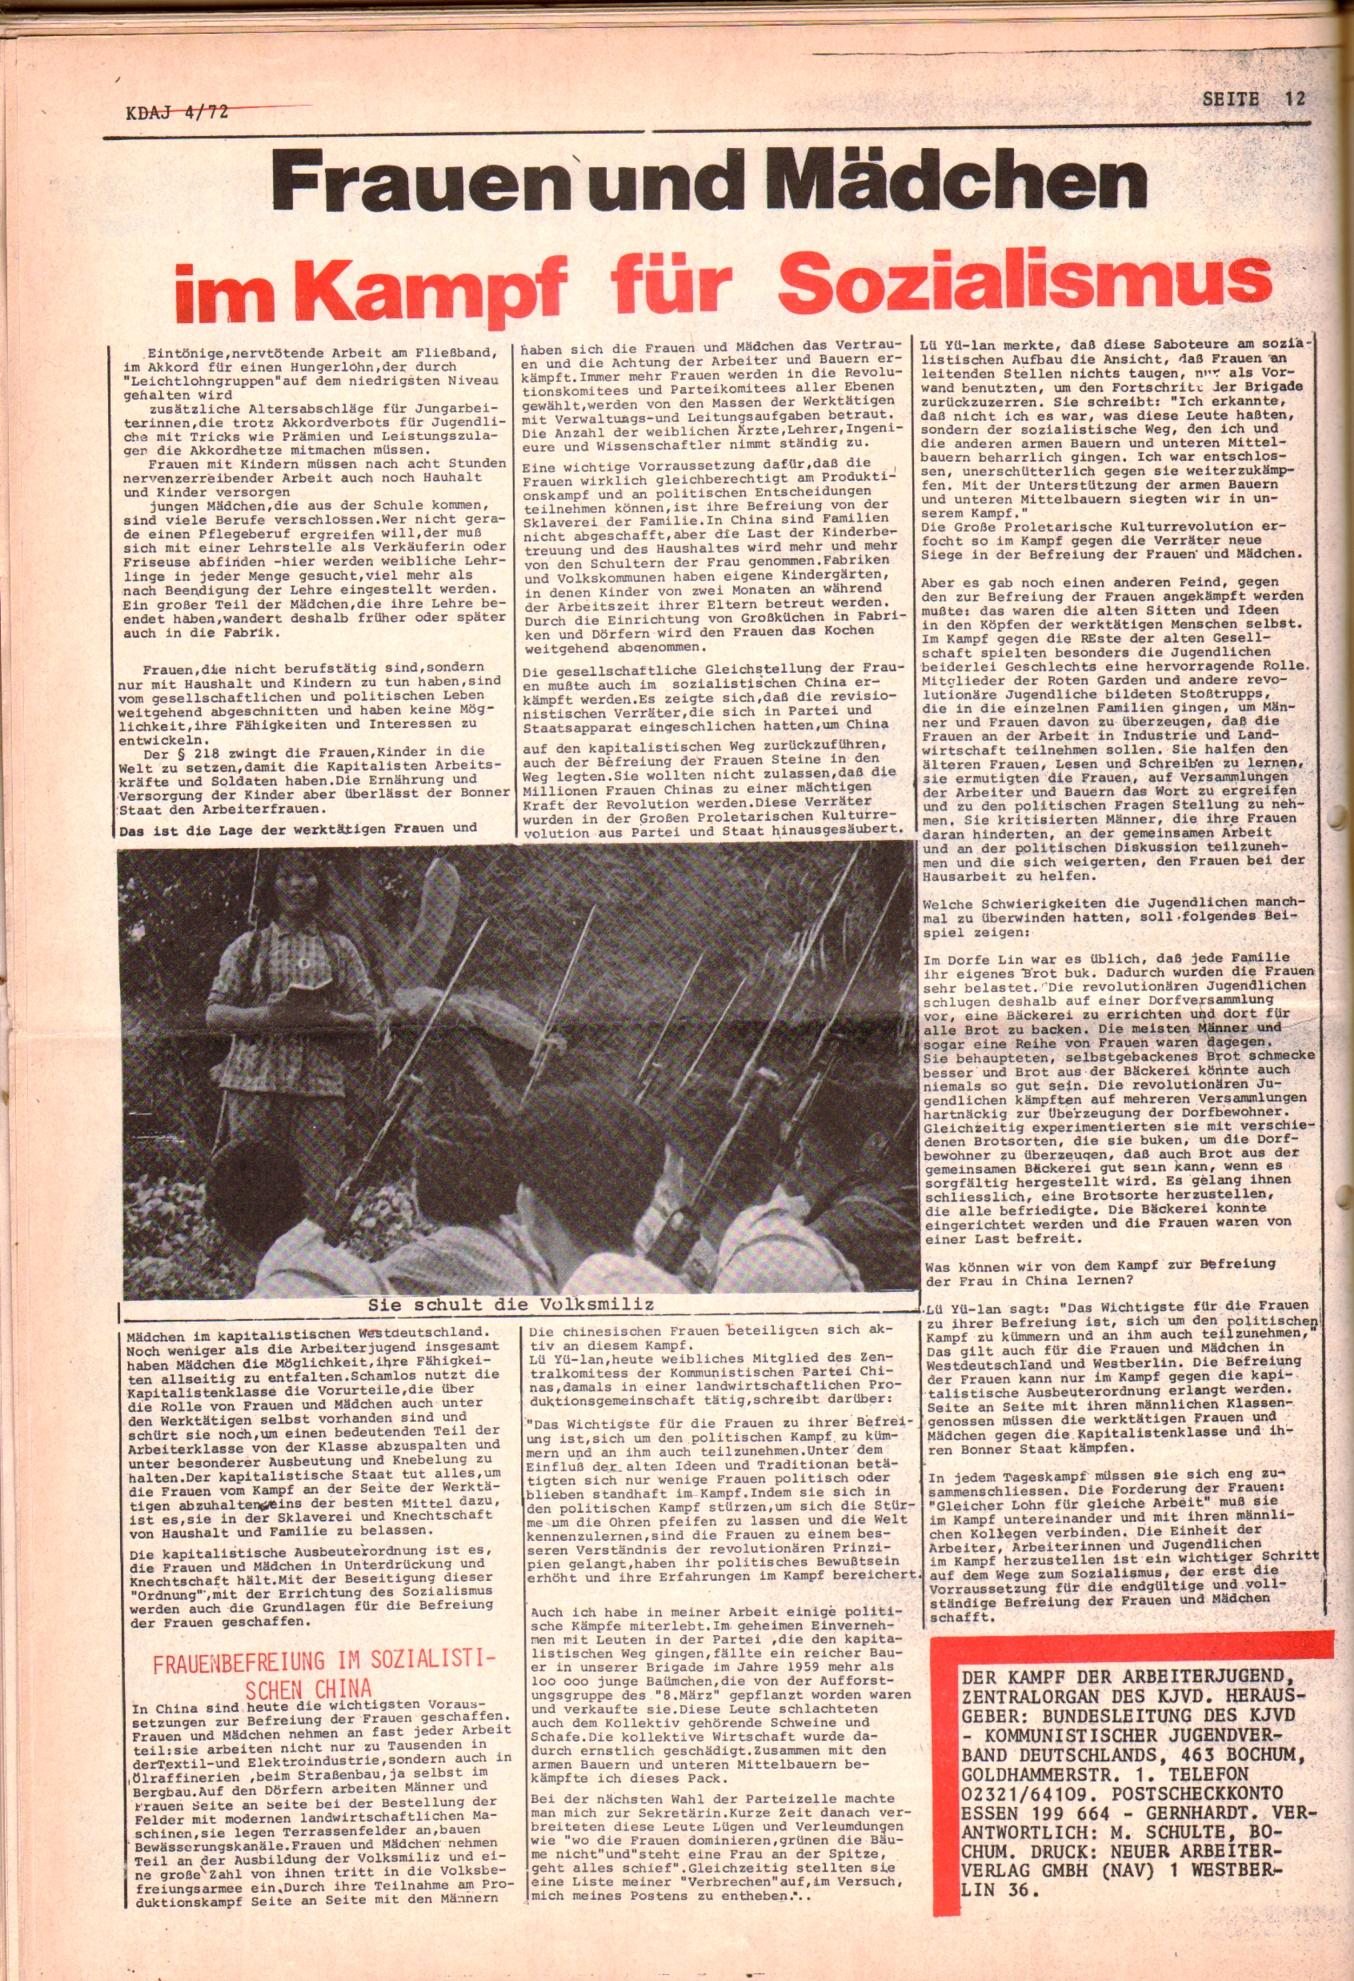 KDAJ, 3. Jg., Mai 1972, Nr. 4, Seite 12